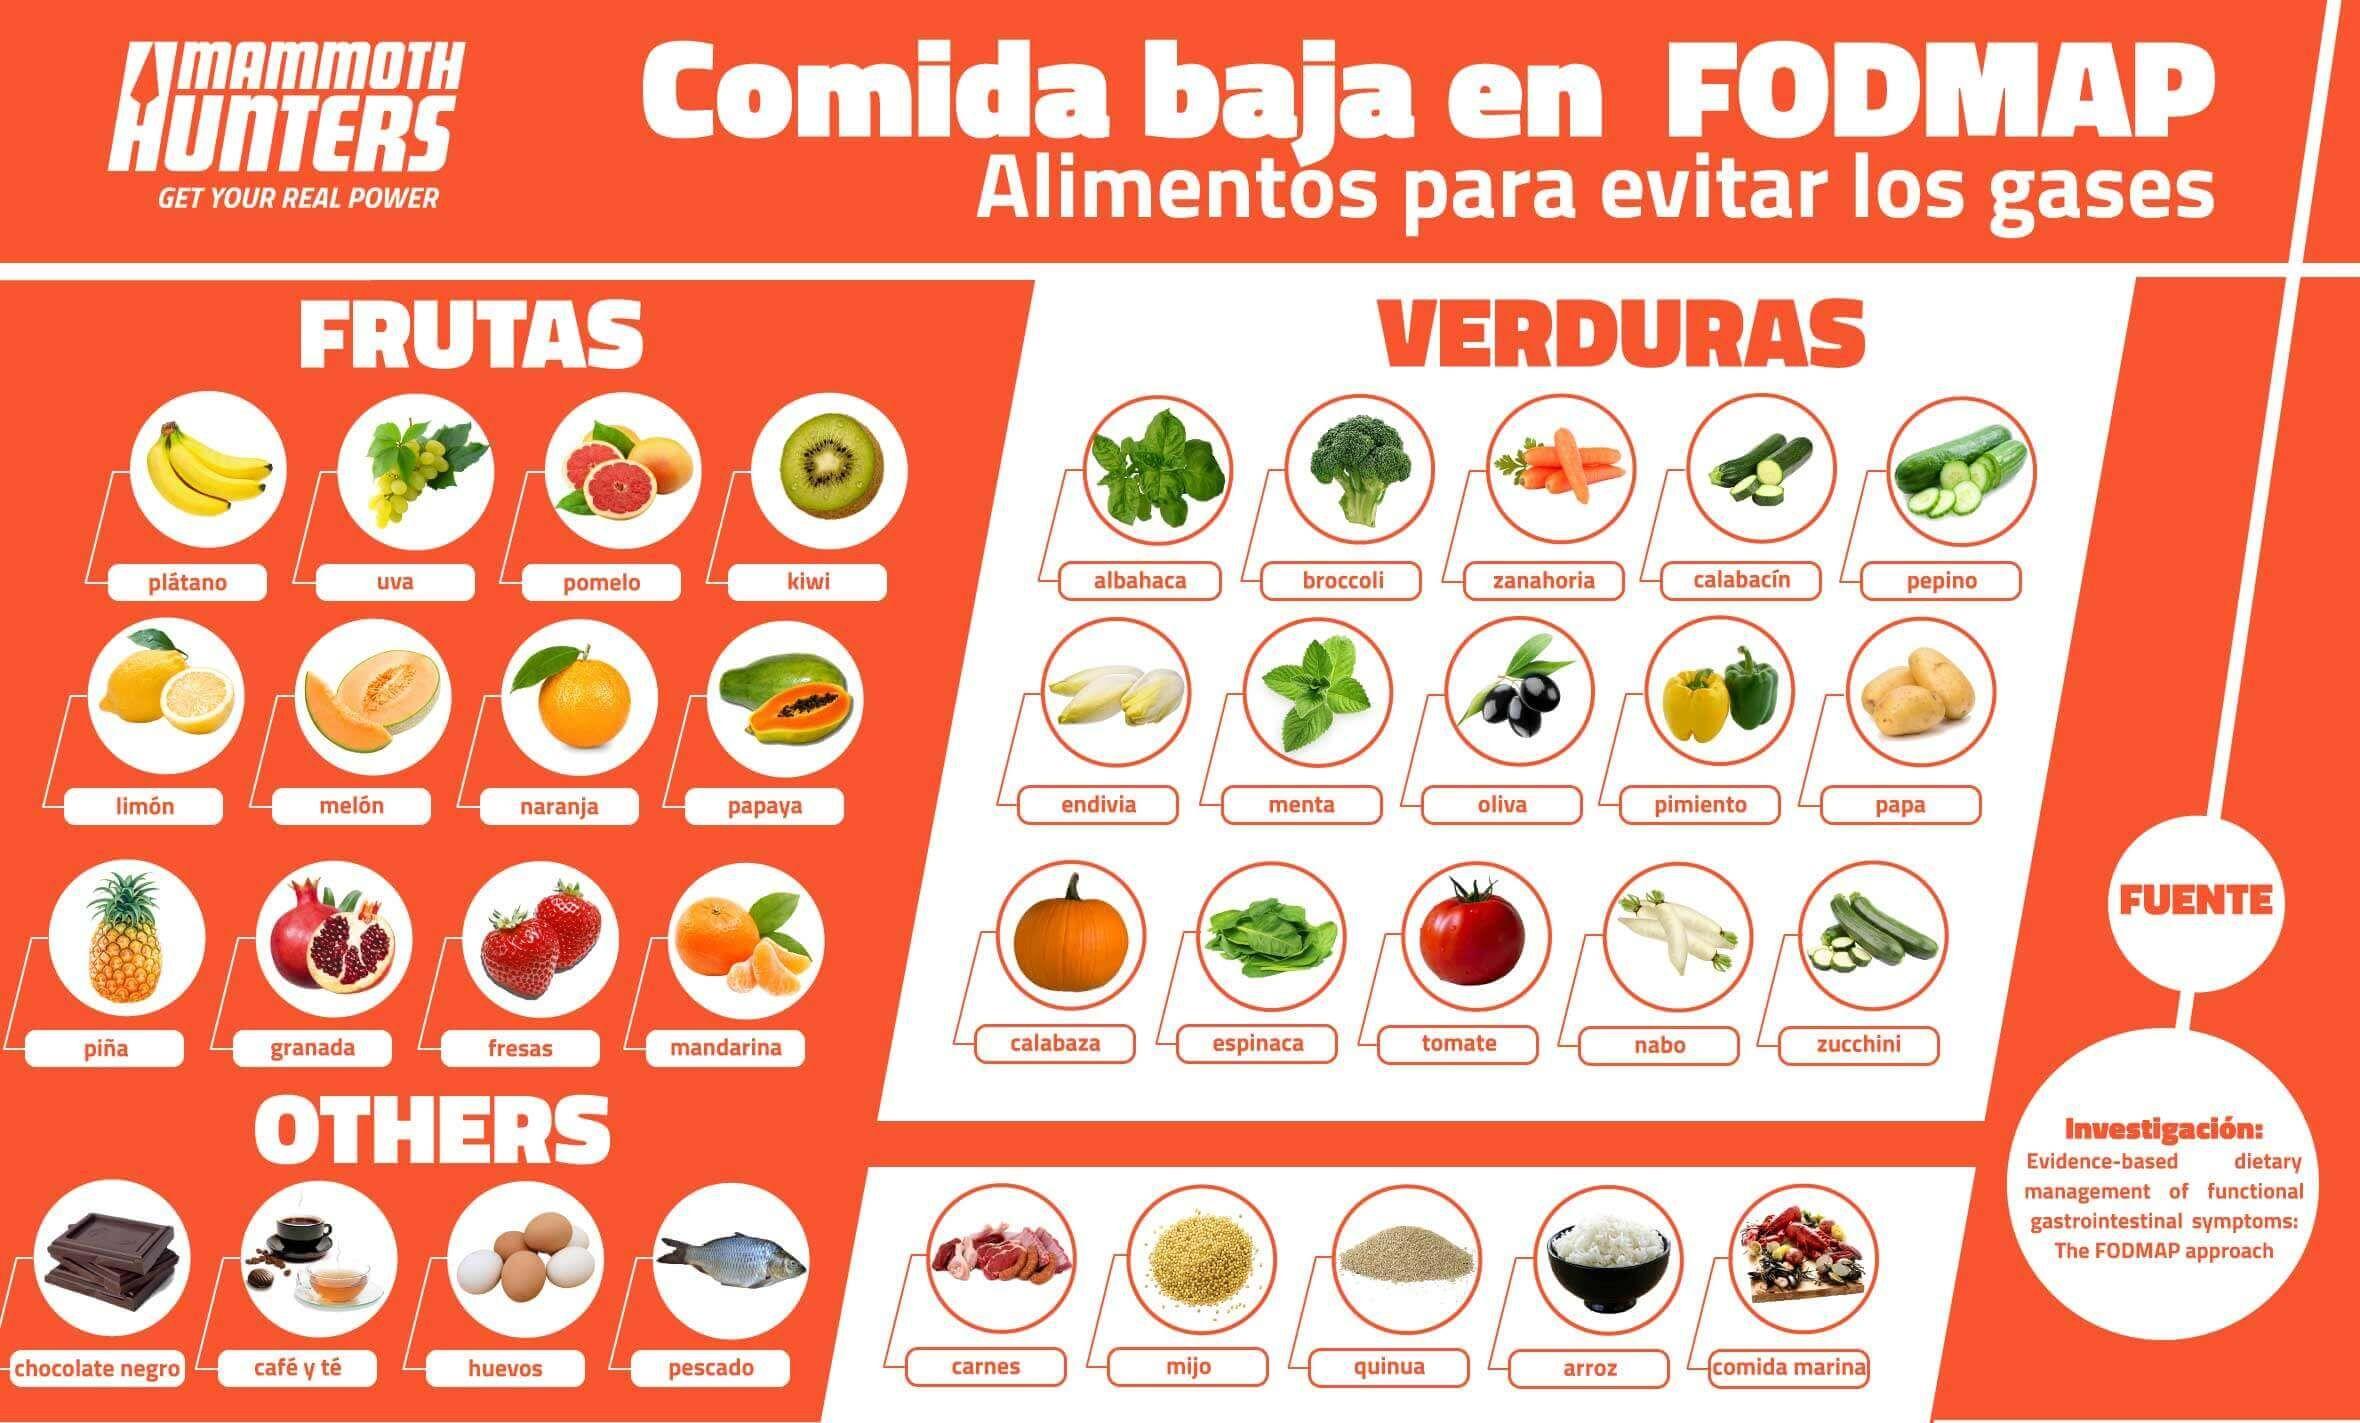 dieta baja en alimentos fodmaps